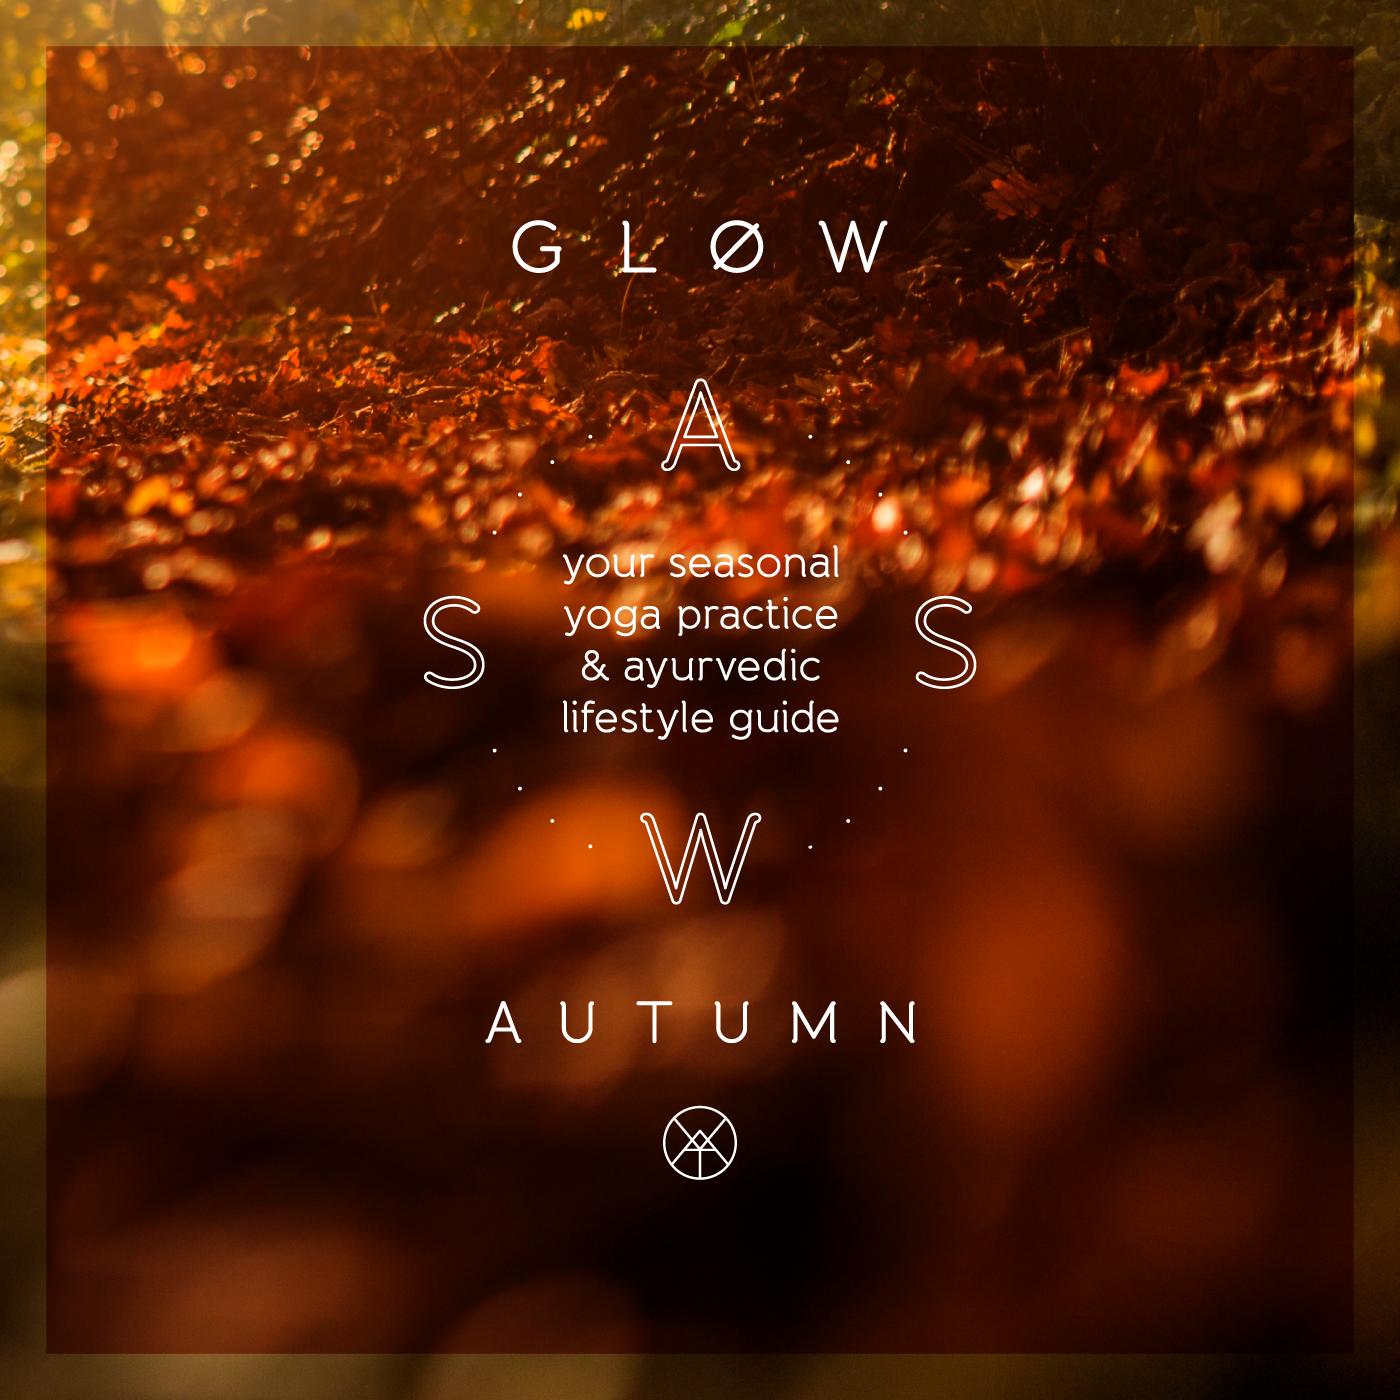 GLOW-SEASONS-AUTUMN.png